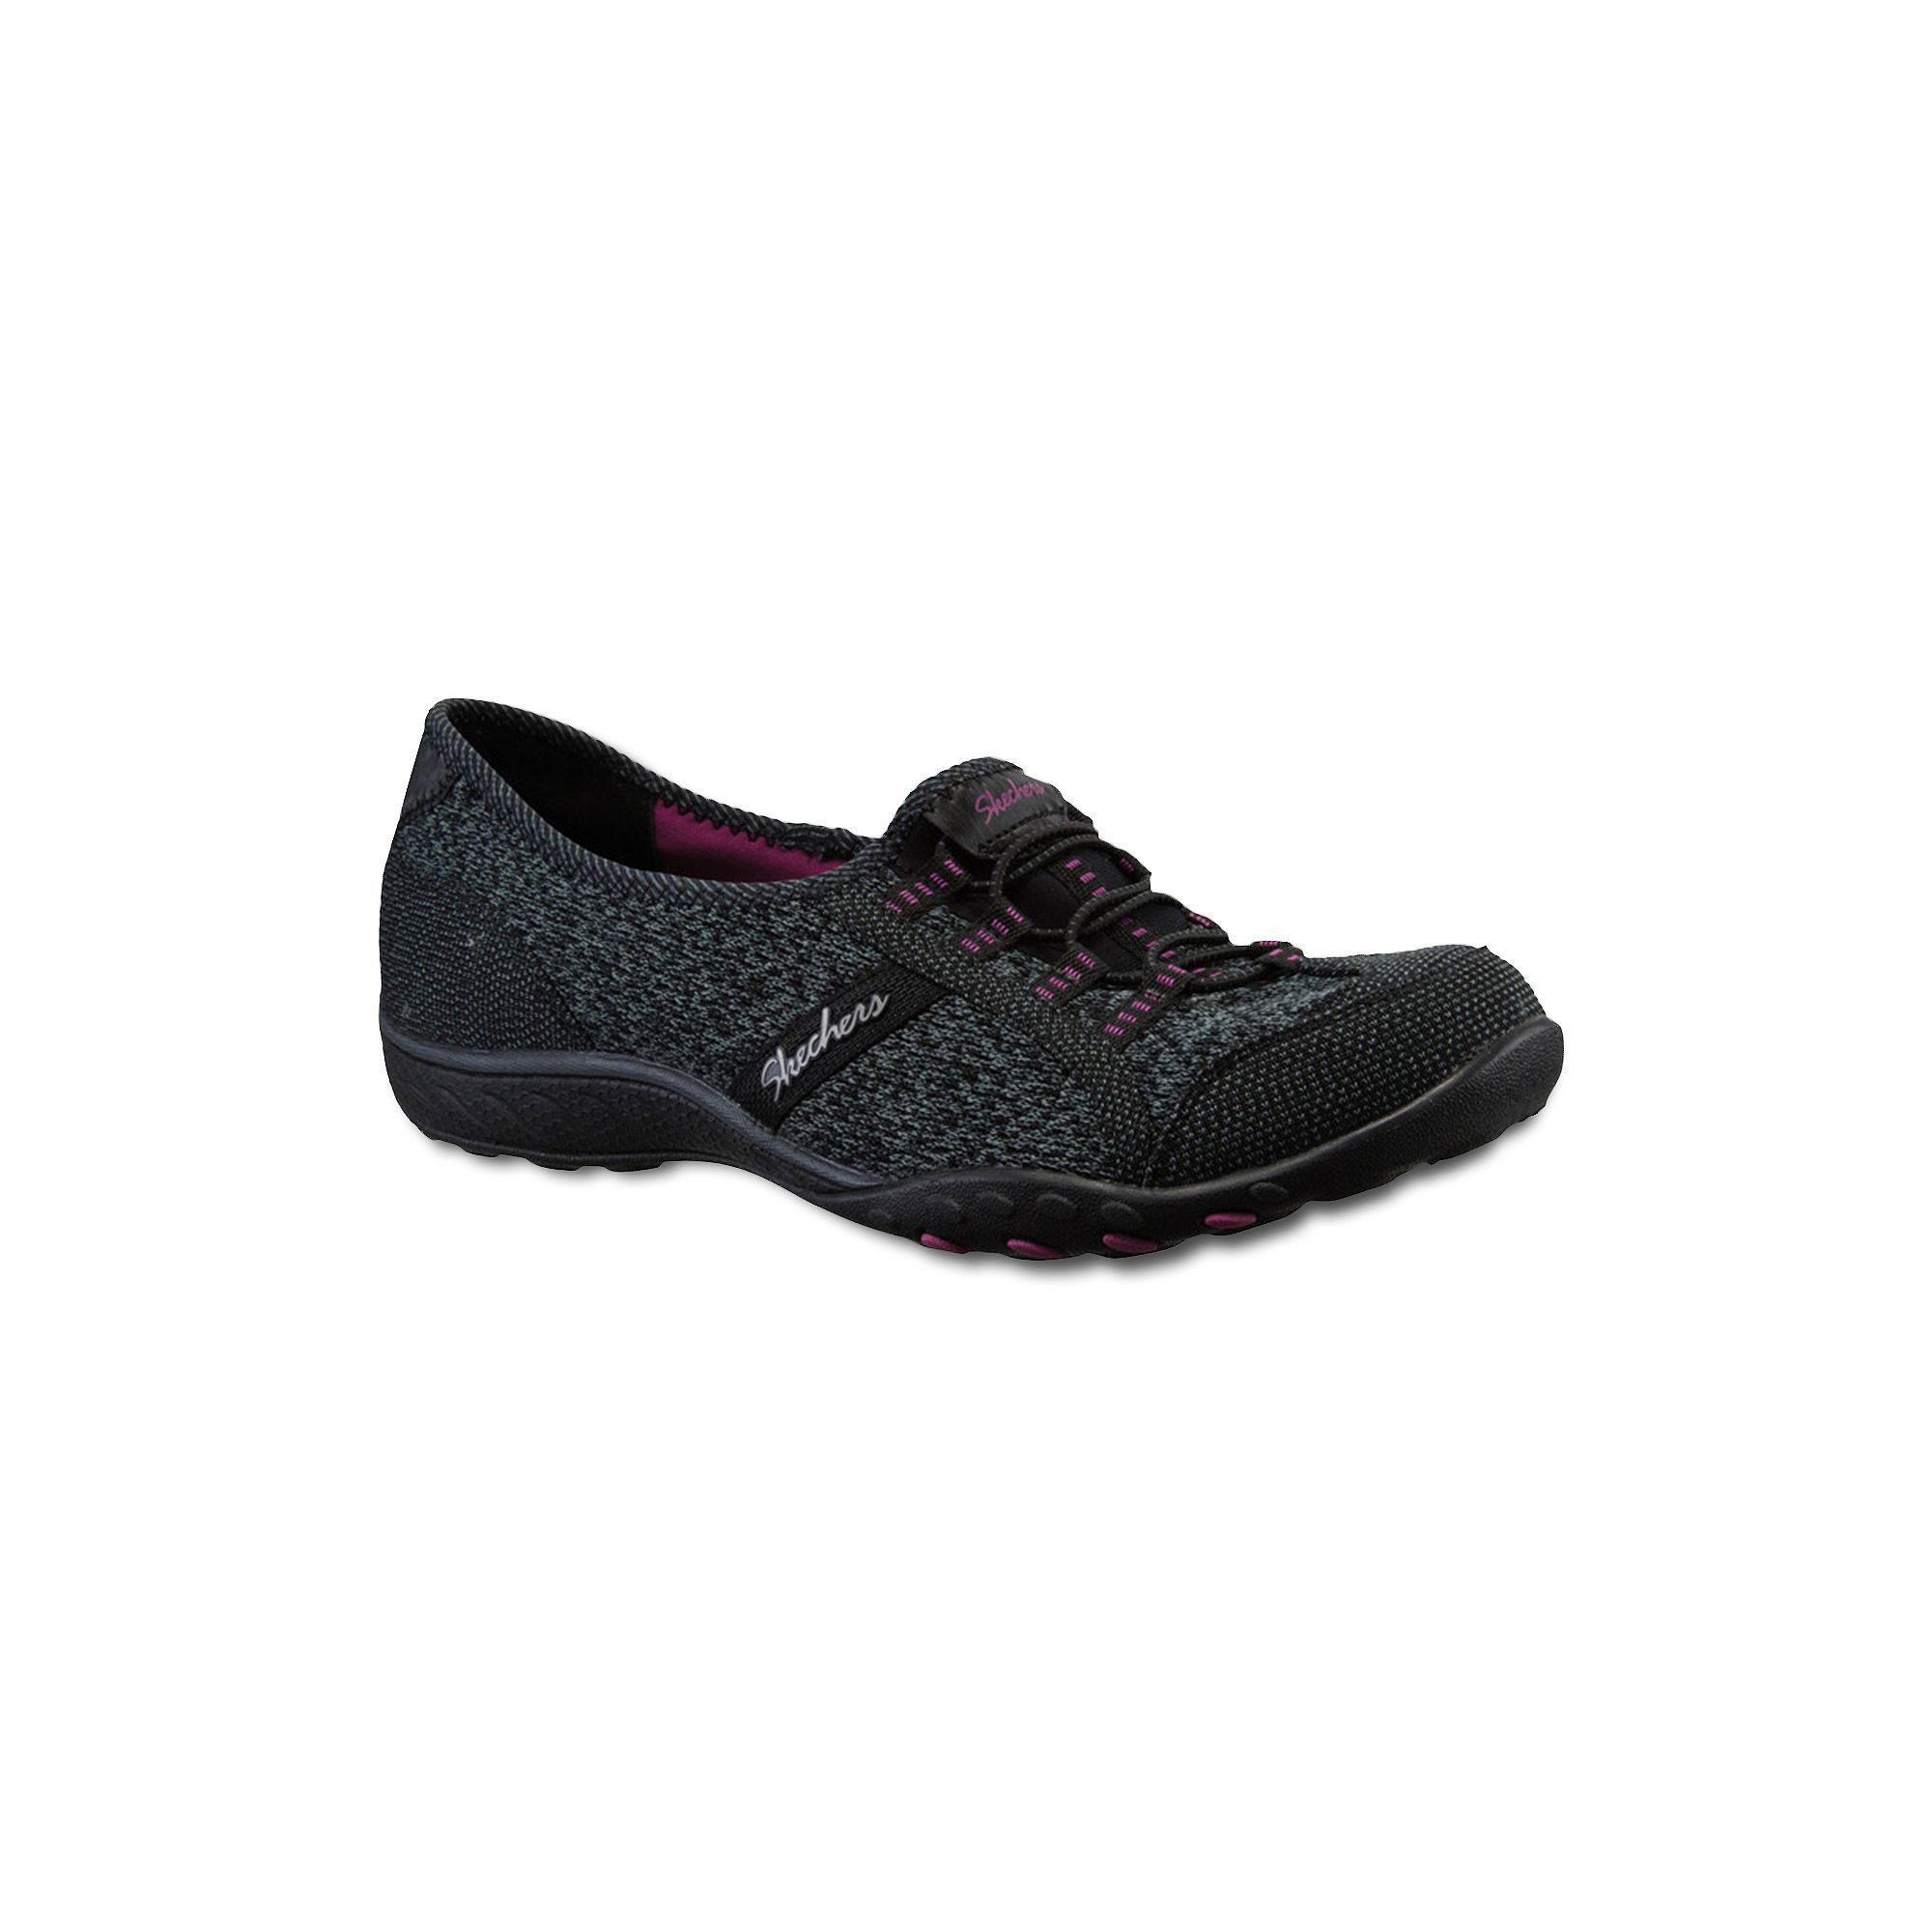 Skechers Black Slip On Athletic Shoes Womens Sz 6